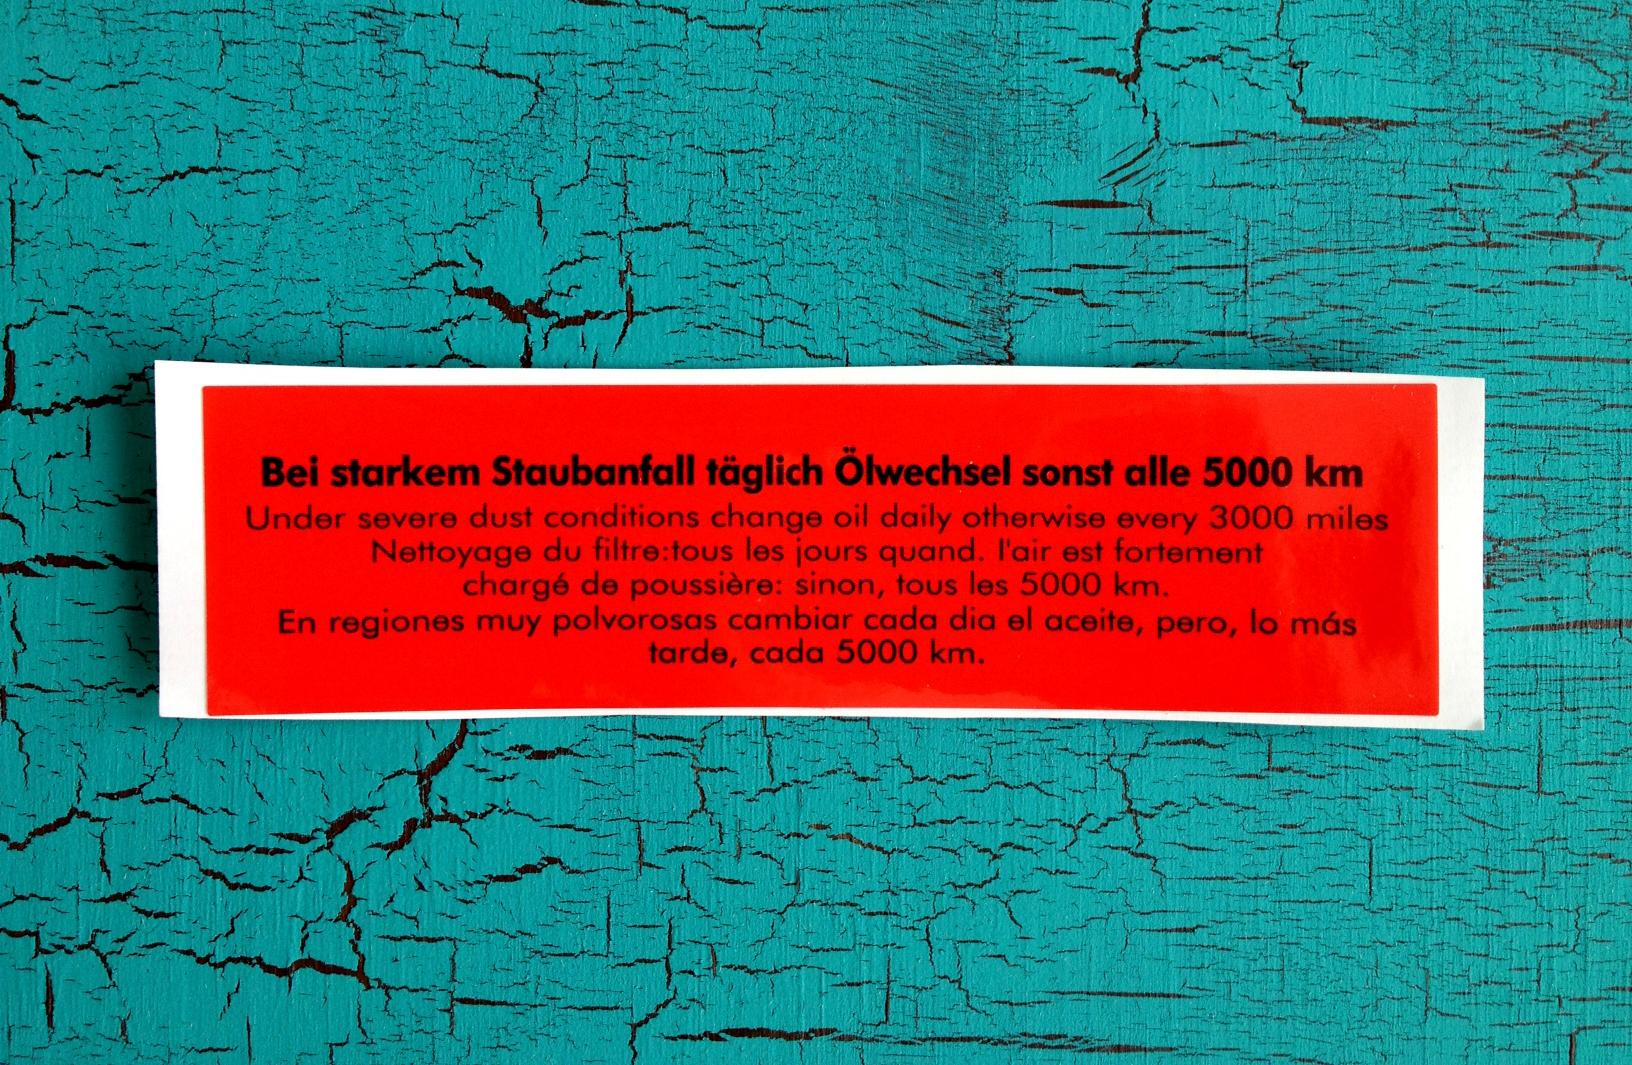 Big Oil Bath Air Cleaner : For sale — oil bath air cleaner decals vw beetle